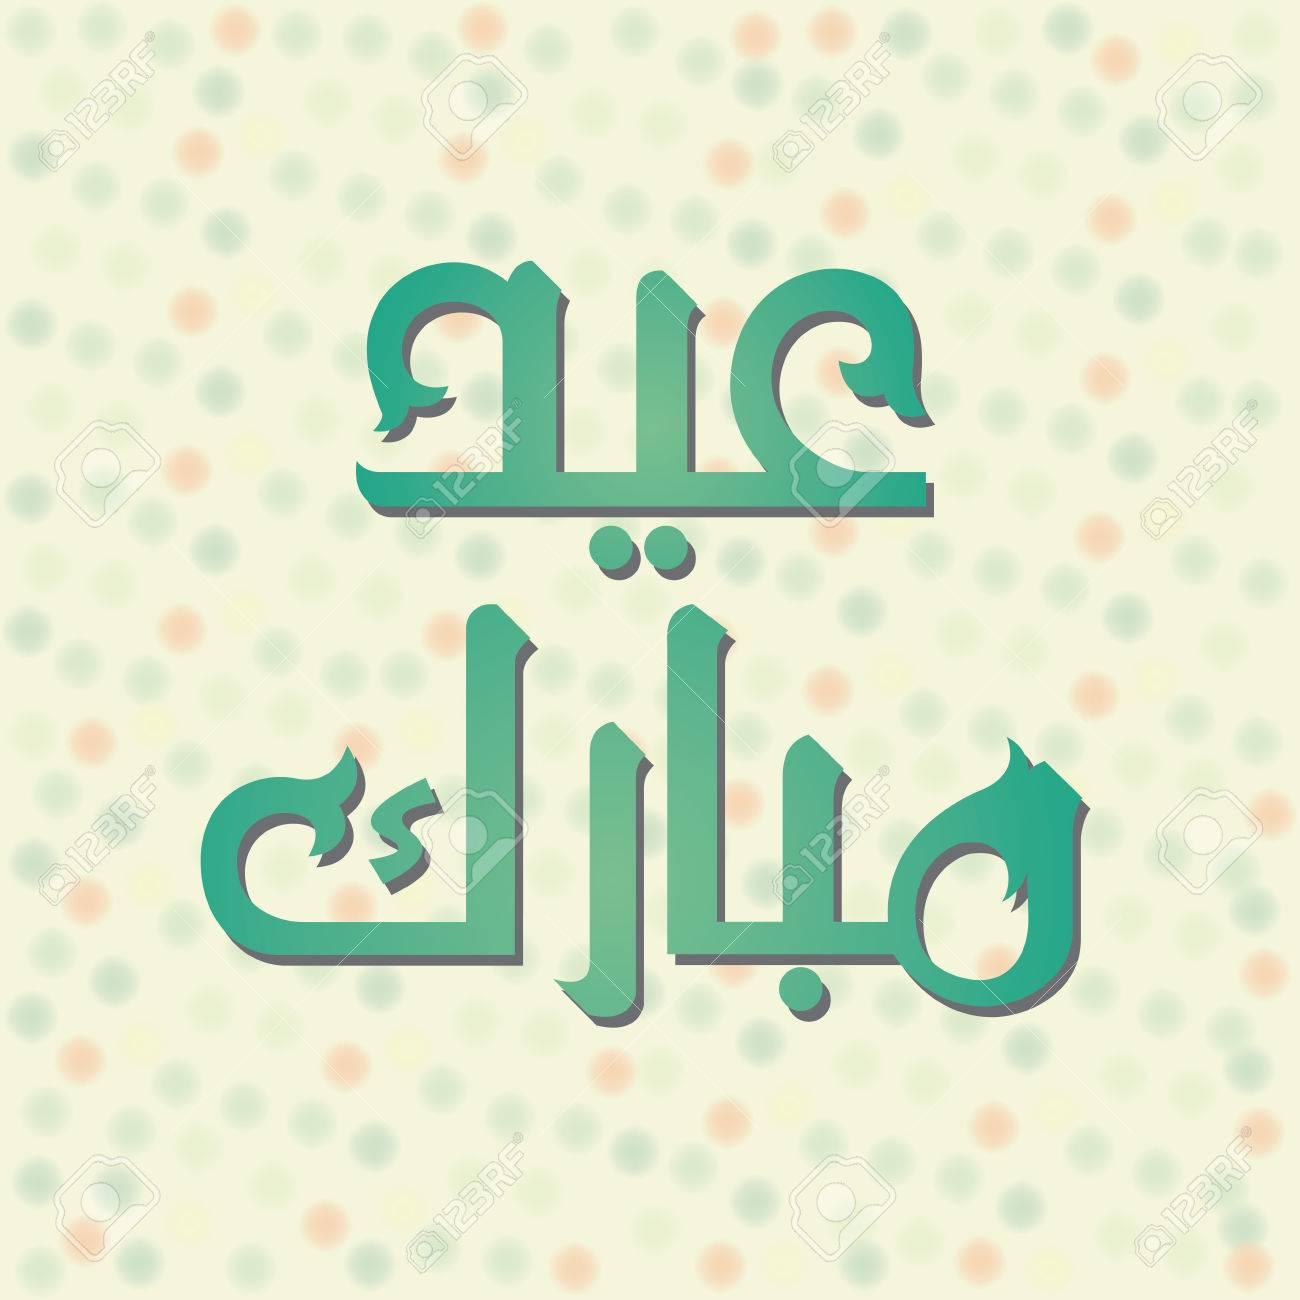 Urdu Arabic Islamic Calligraphy Of Text Eid Mubarak For Muslim Royalty Free Cliparts Vectors And Stock Illustration Image 40696577